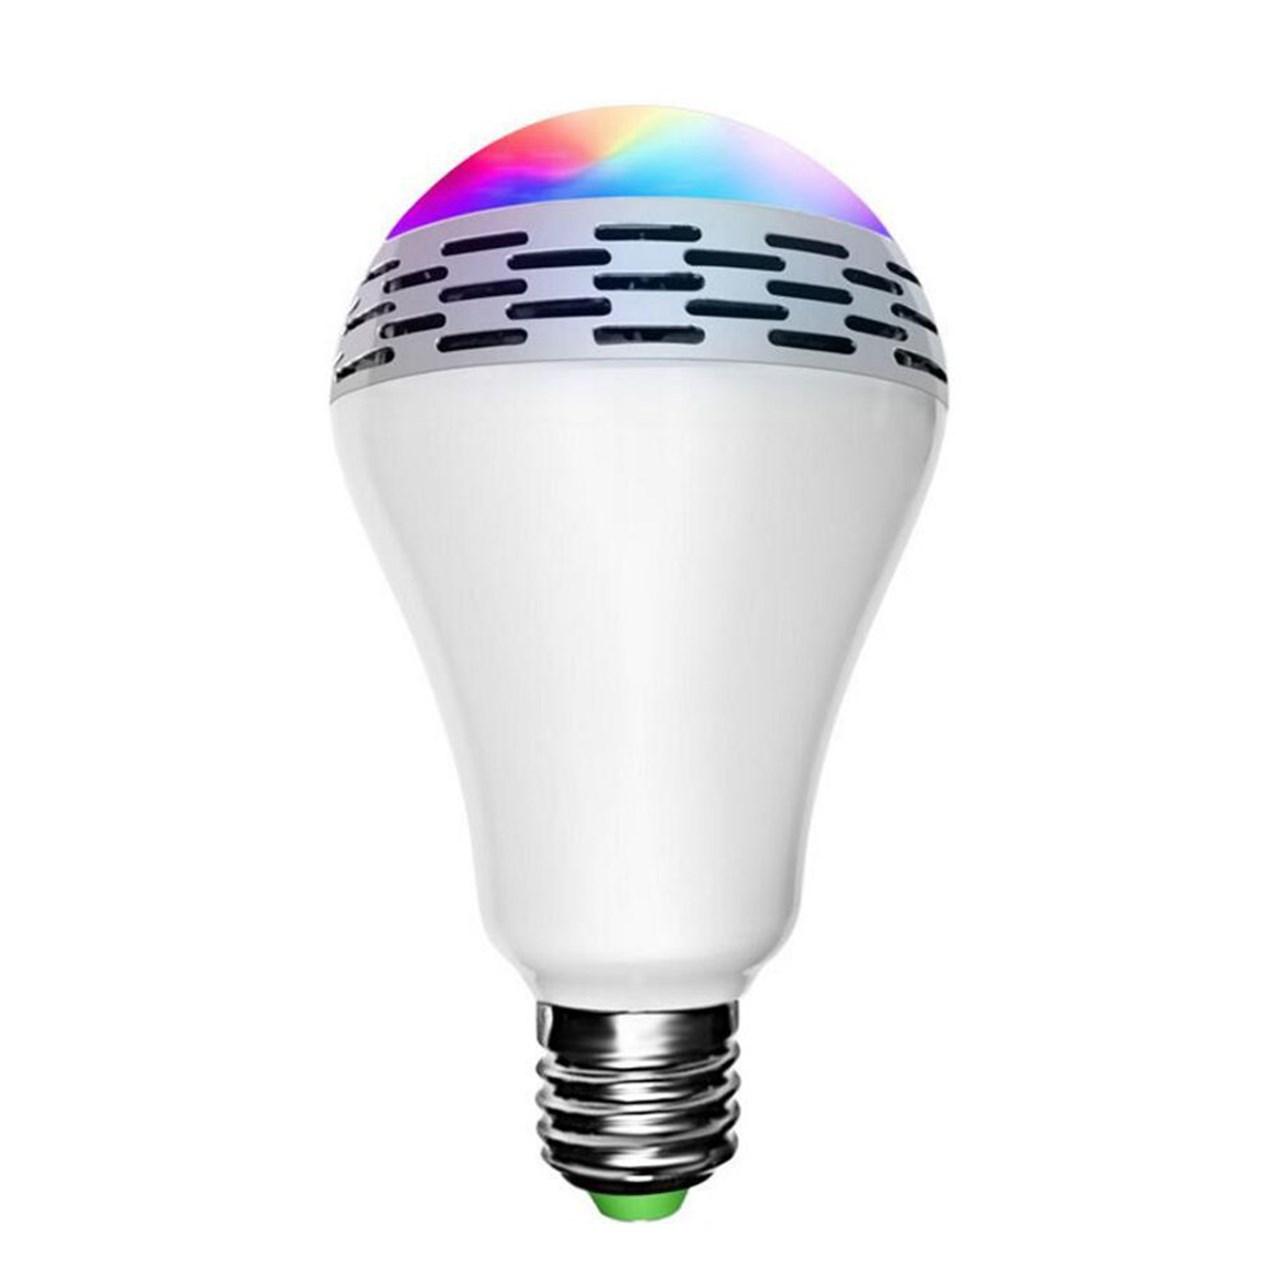 لامپ هوشمند و اسپیکر بلوتوث مدل S-15